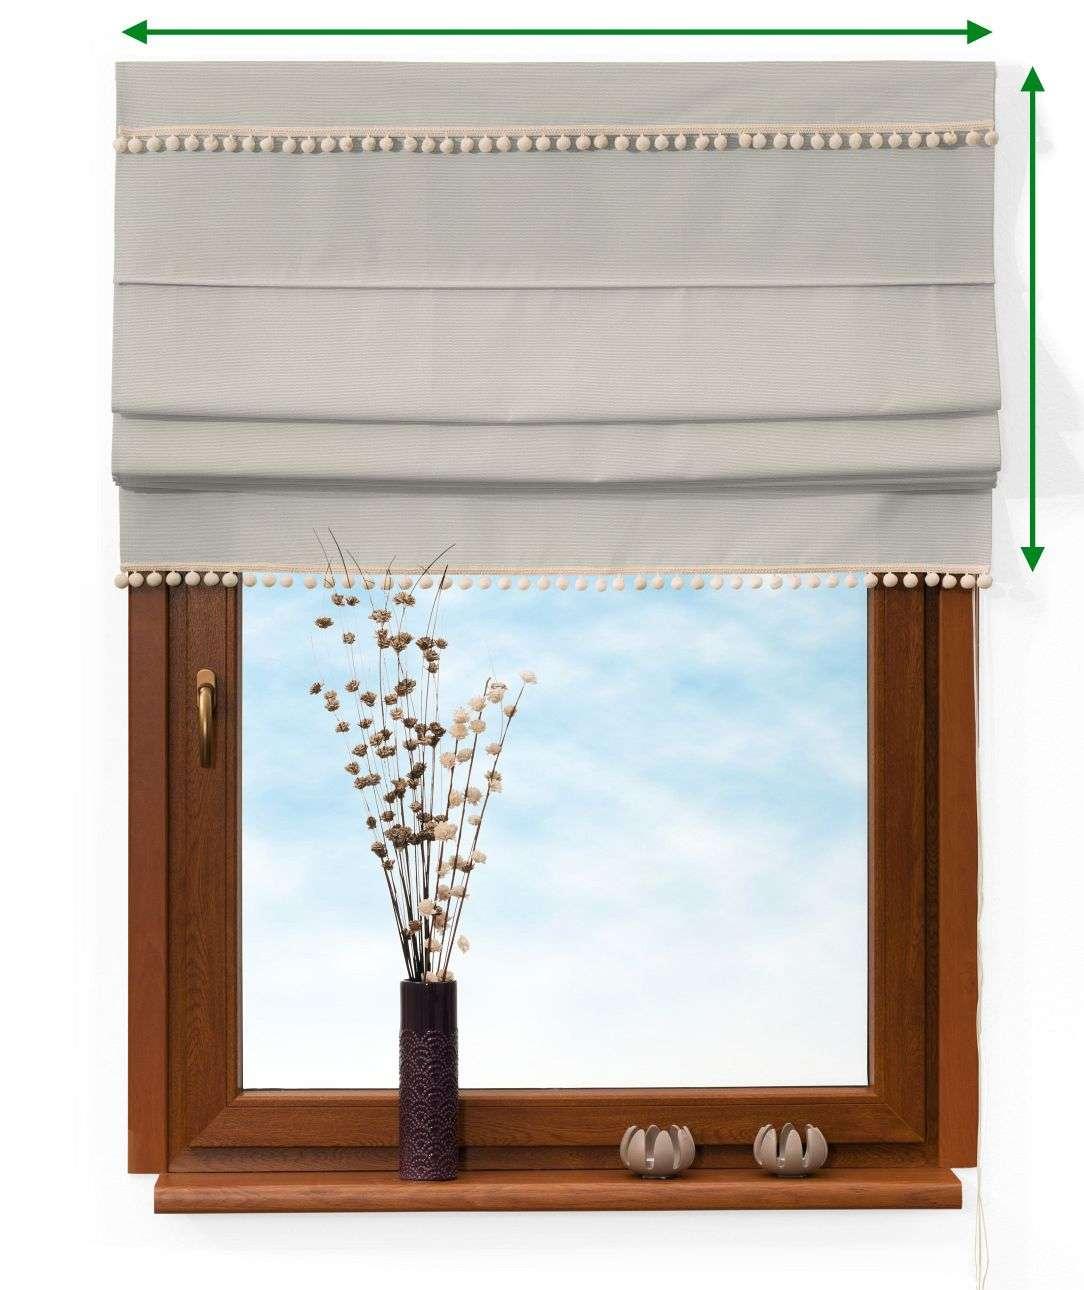 Roleta rímska s brmbolcami V kolekcii Cotton Panama, tkanina: 702-31